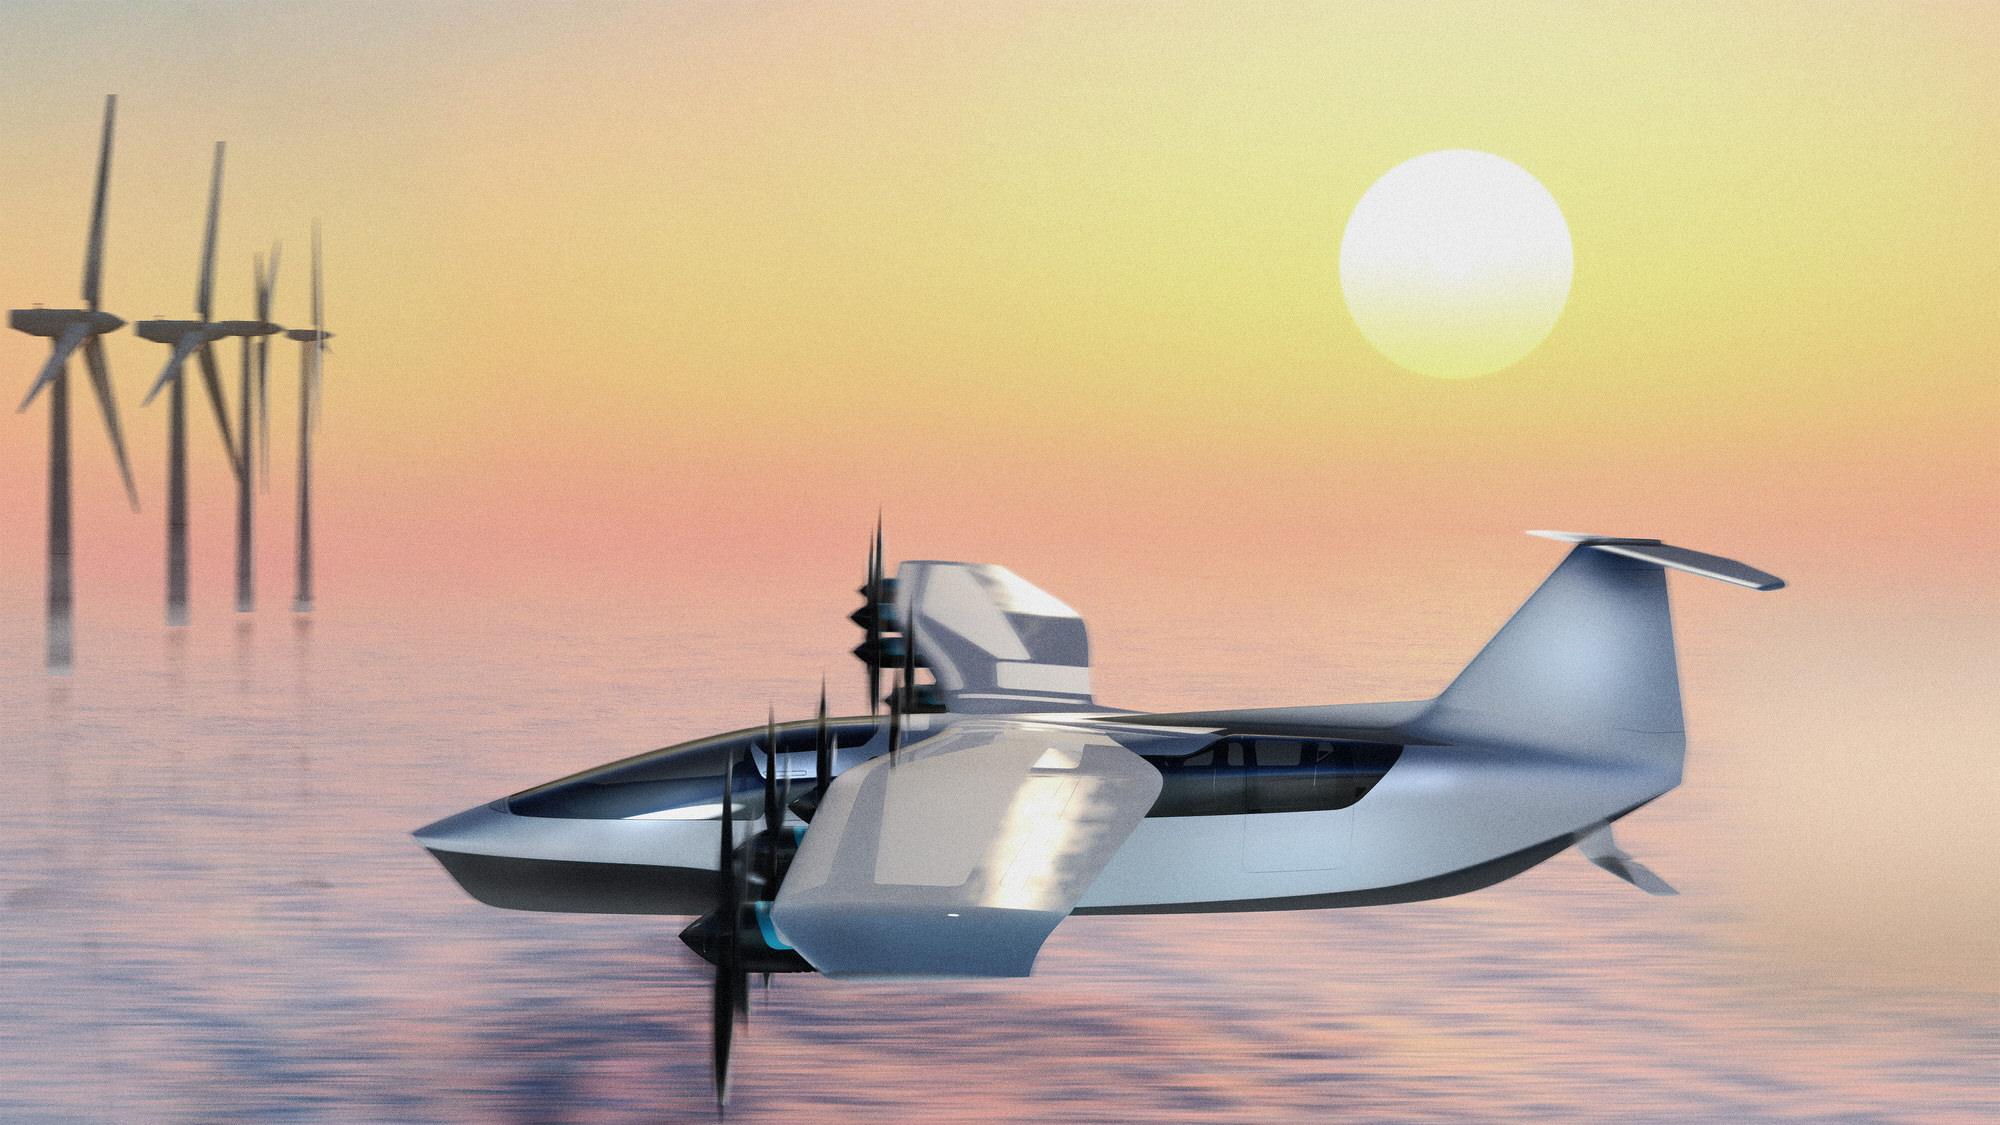 Regent Seaglider fliying over water during sunset